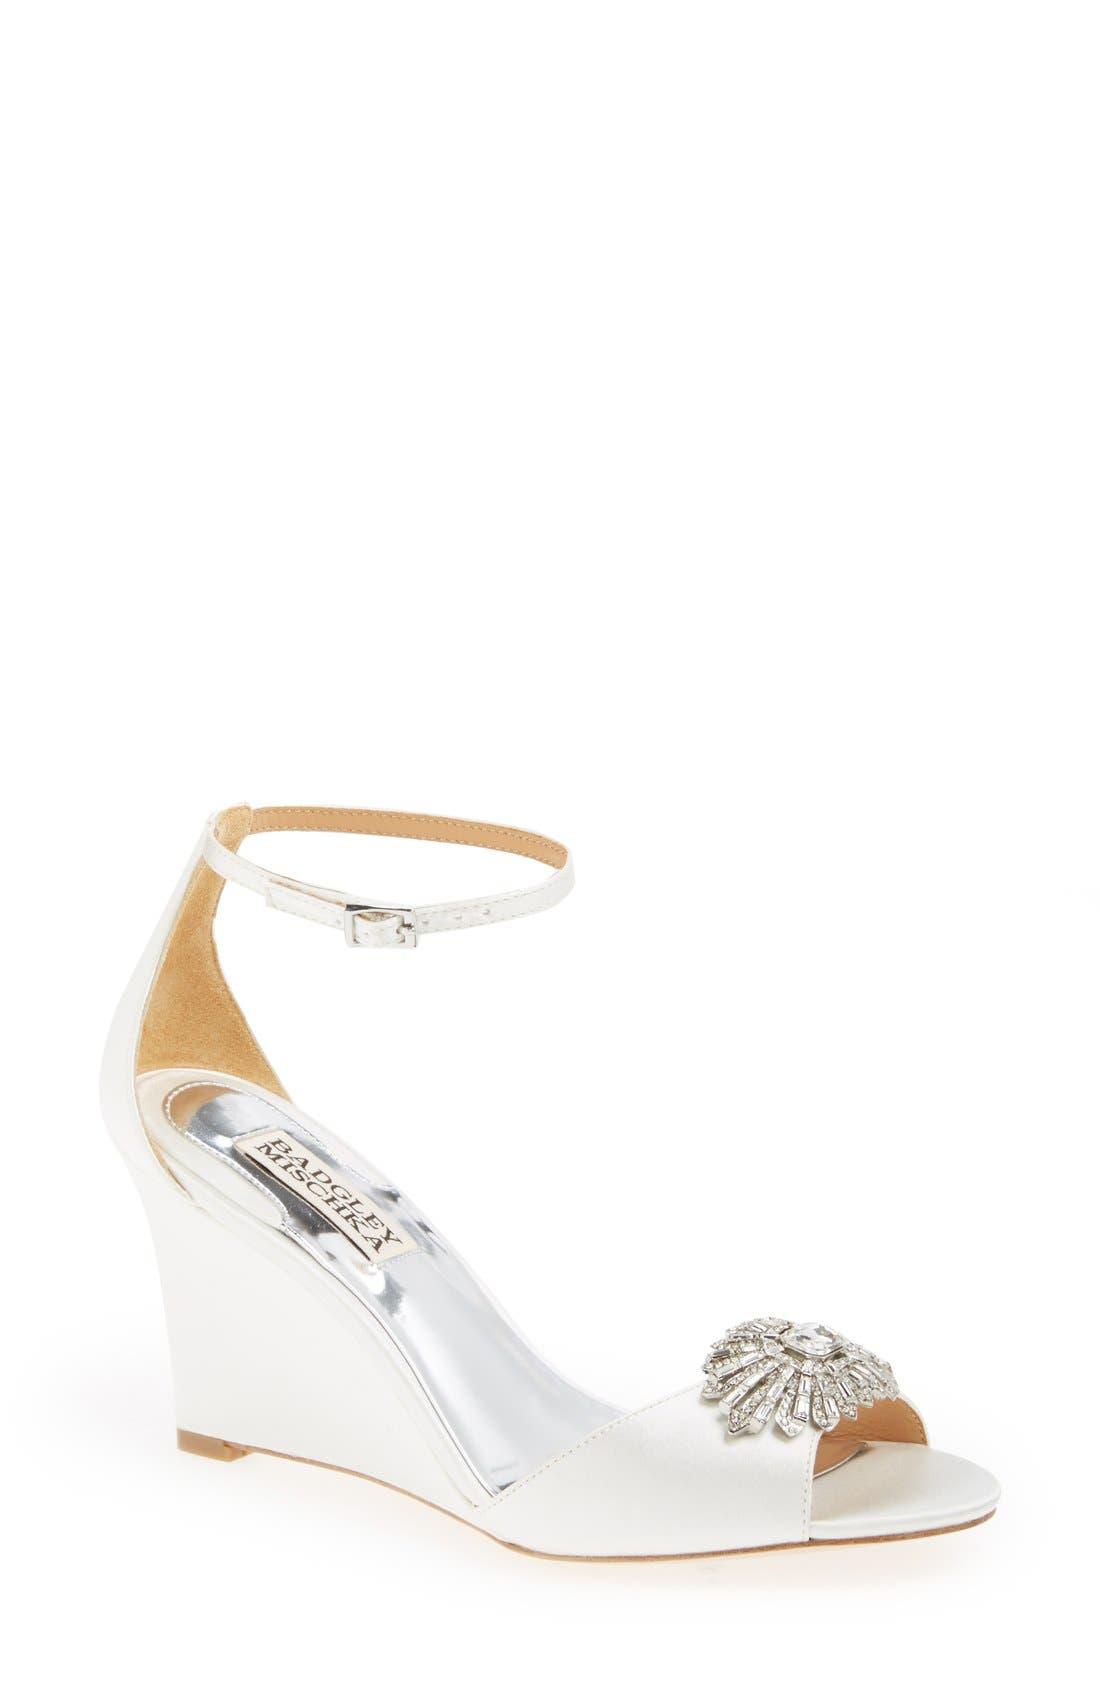 Main Image - Badgley Mischka 'Harmony' Sandal (Women)